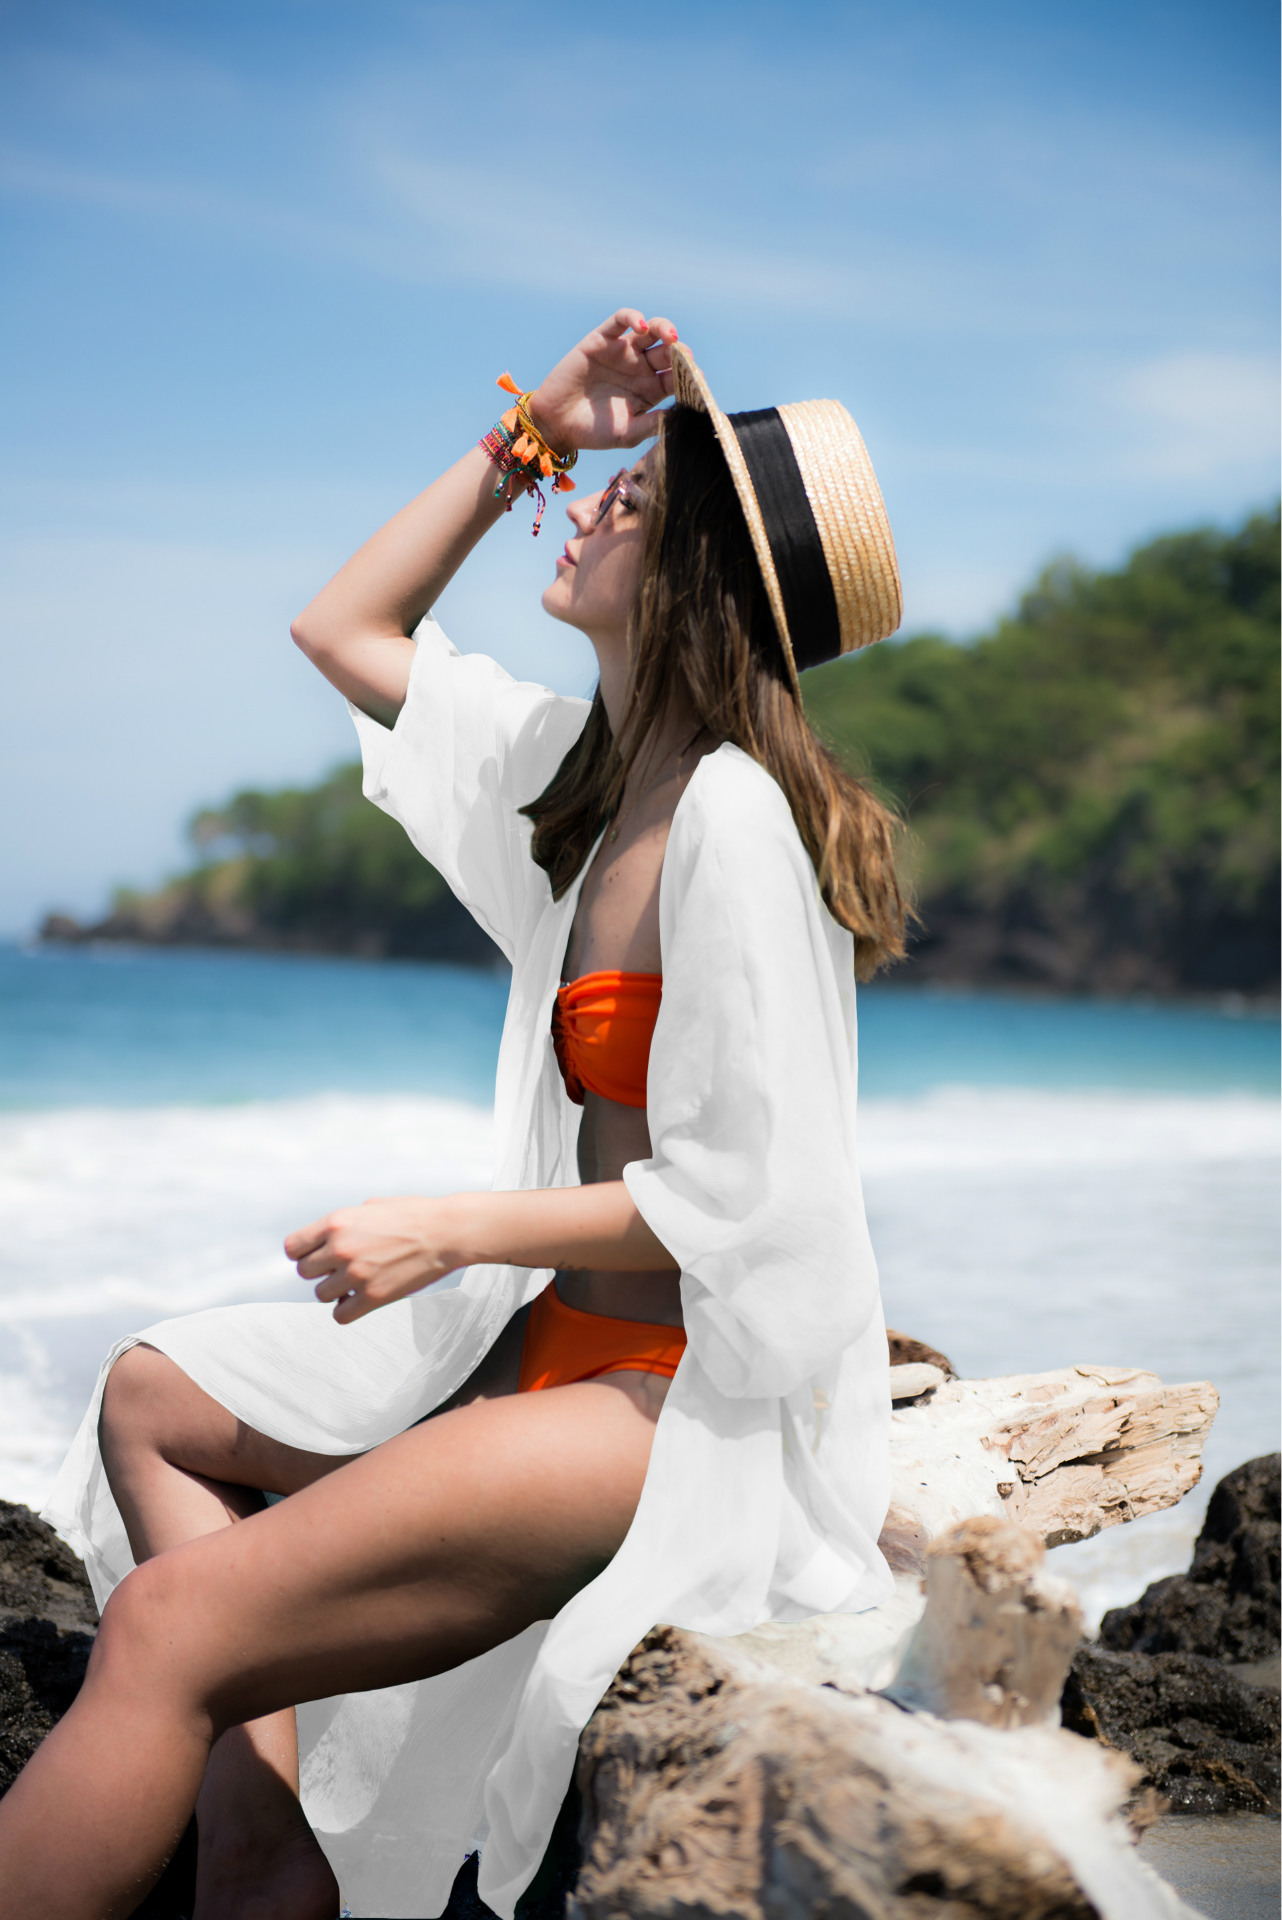 Europe And America Pure Chiffon Cardigan Beach Skirt Long Skirts Bikini Bathing Suit Outer Blouse Holiday Skirt Seaside Sun Shir